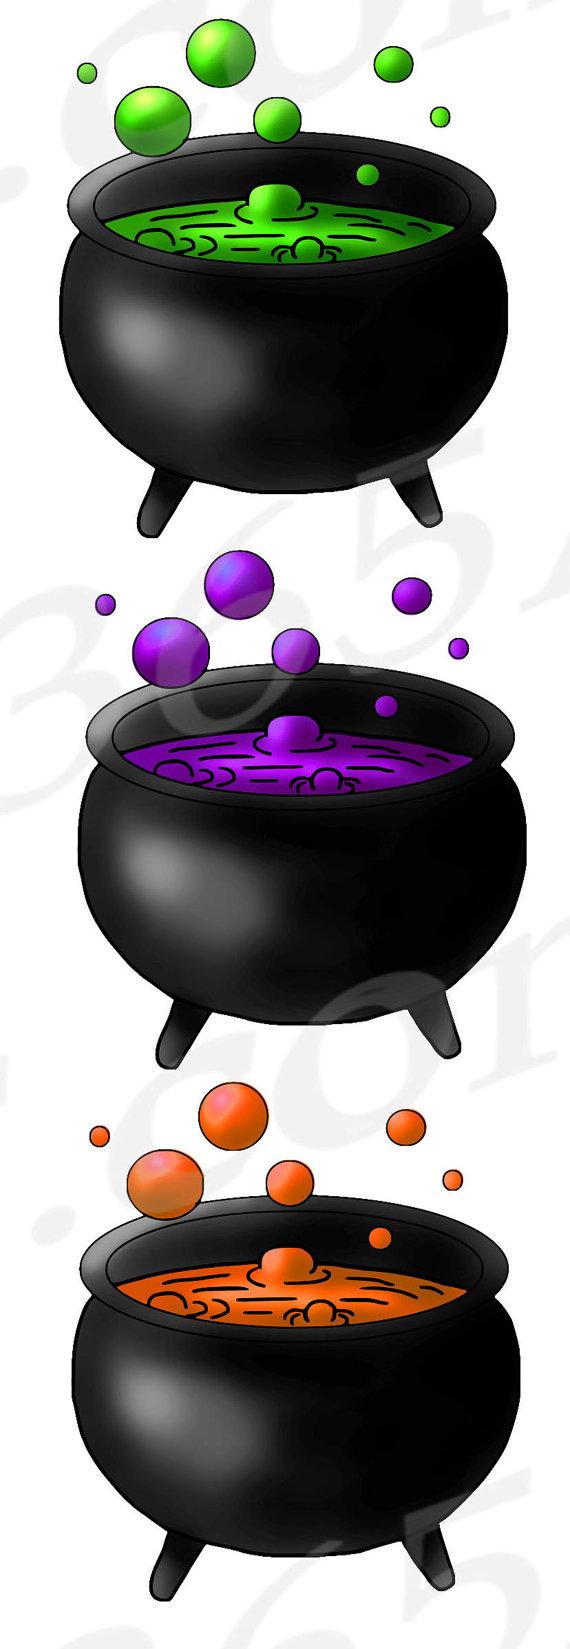 Cauldron Images